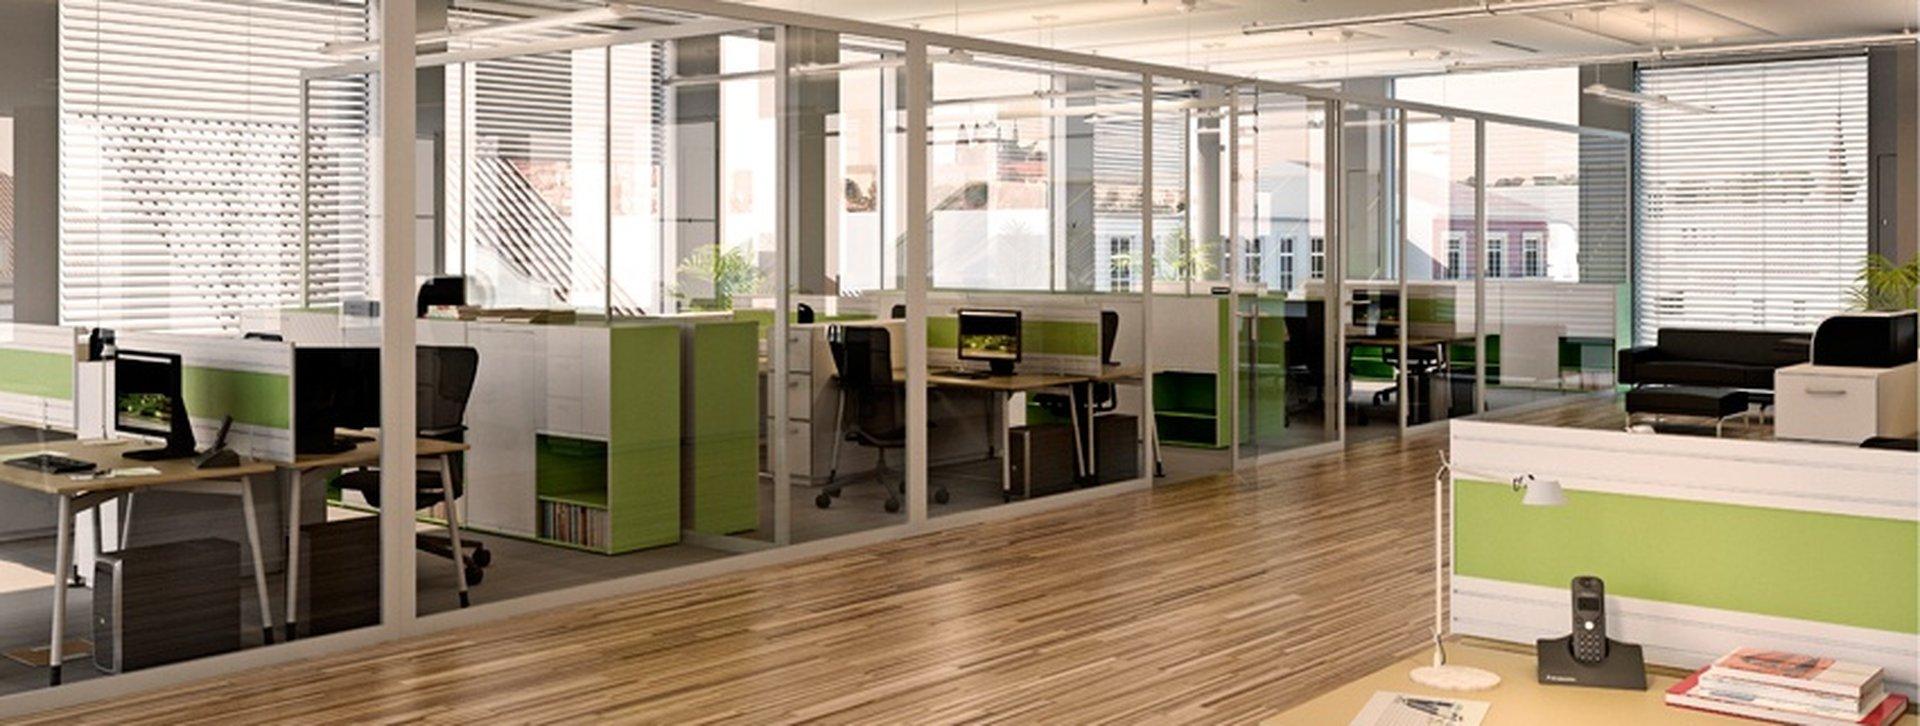 office_interier_01_l_0001_l